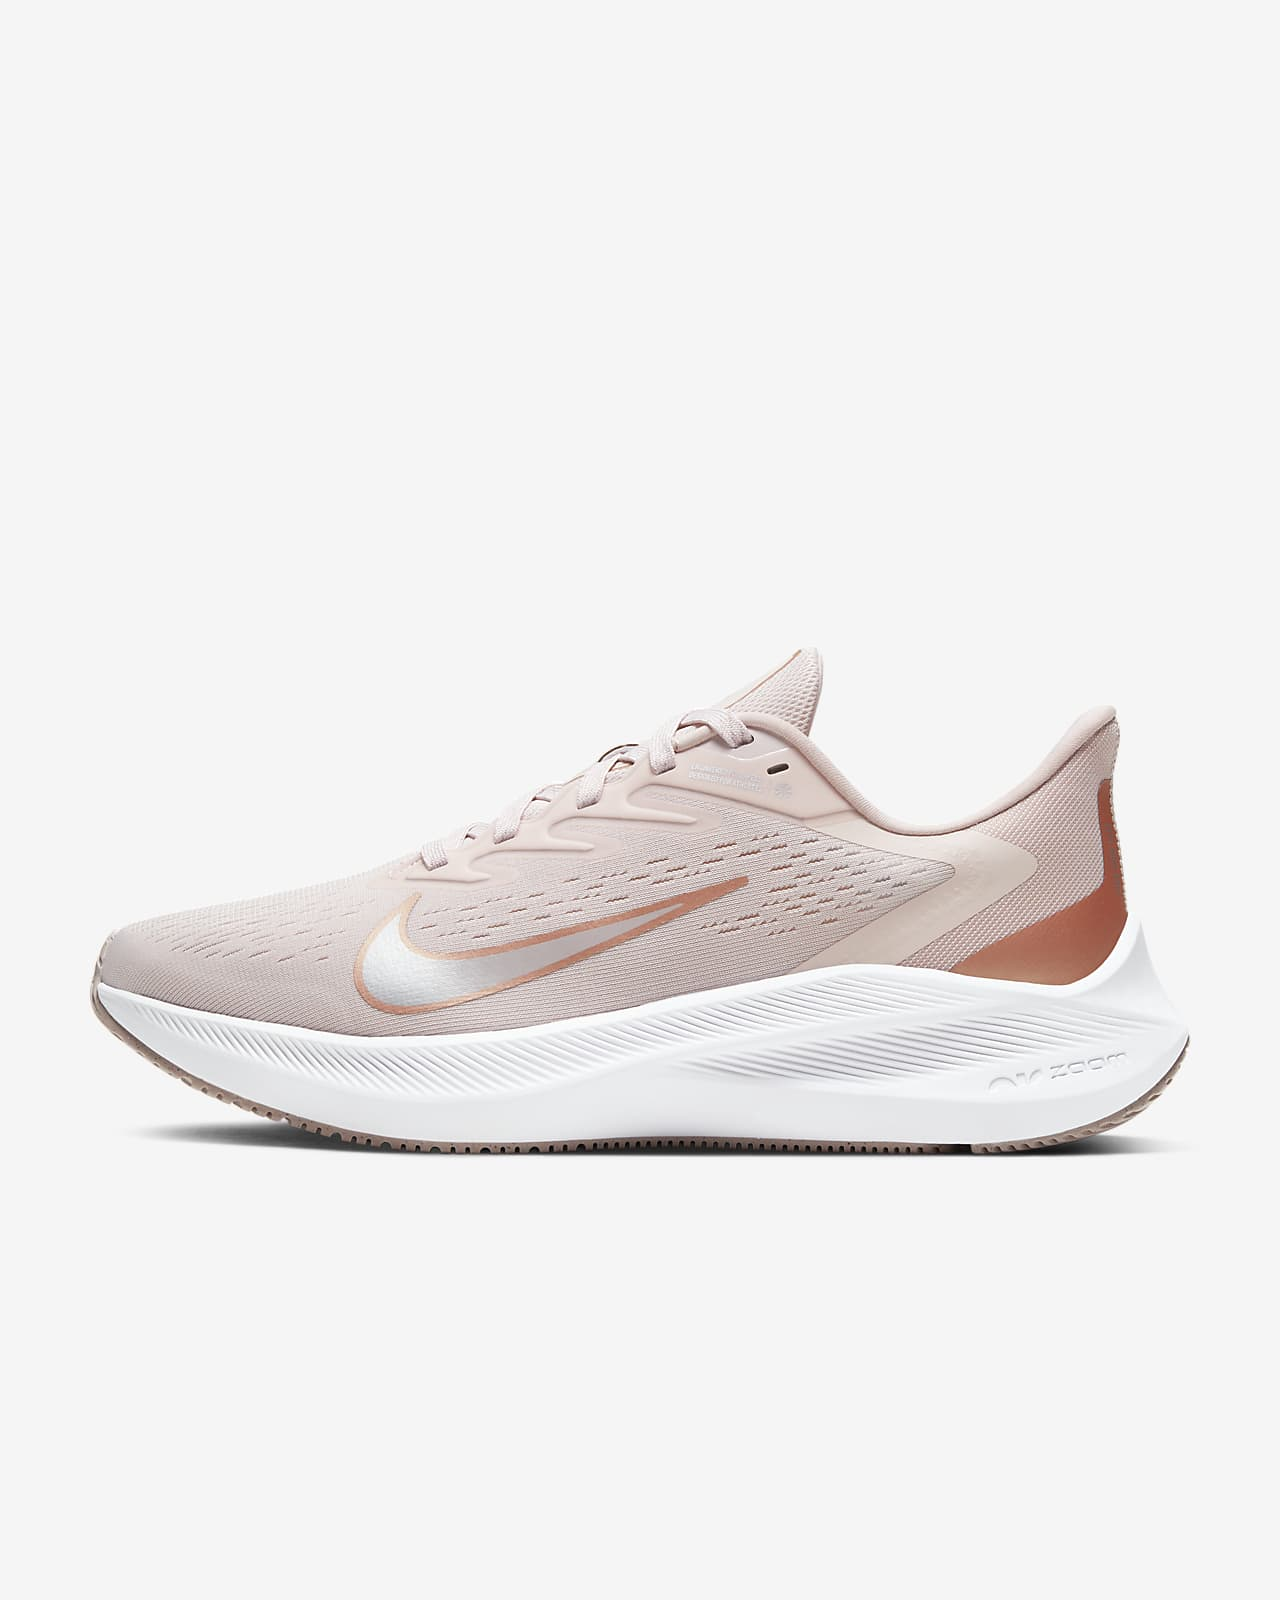 Chaussure de running Nike Air Zoom Winflo 7 pour Femme